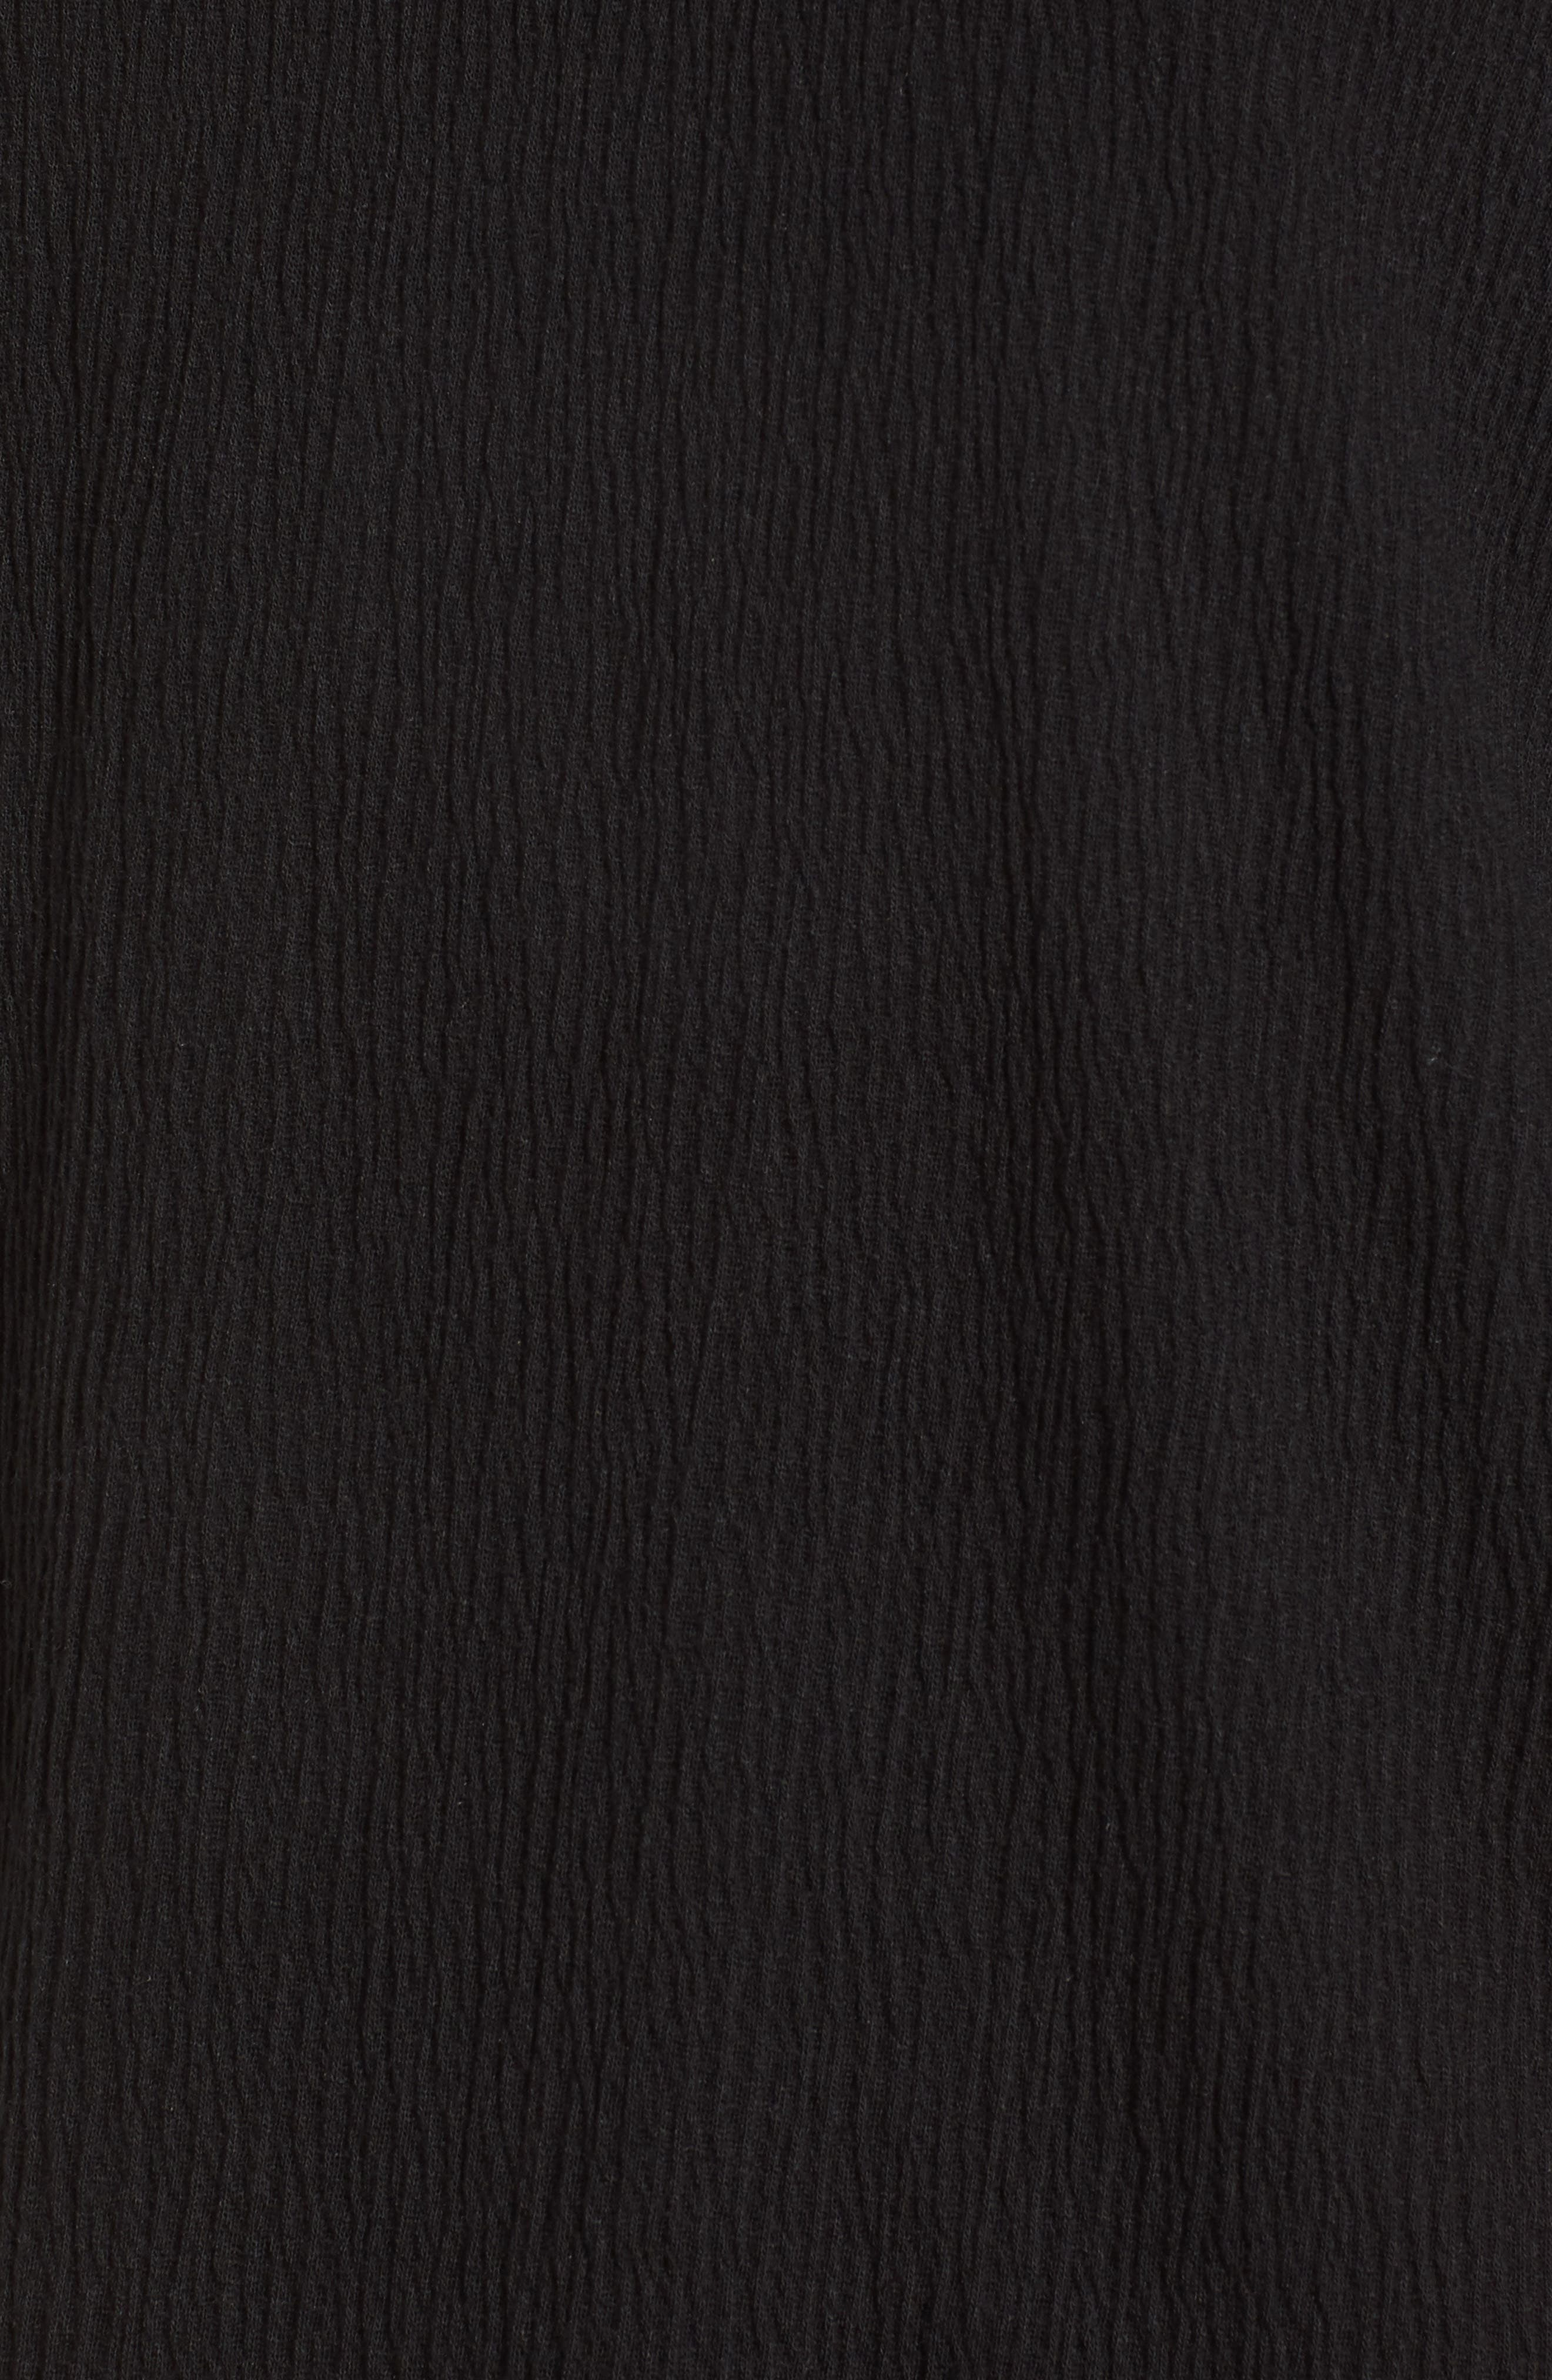 Ruffle Sleeve Top,                             Alternate thumbnail 6, color,                             Black